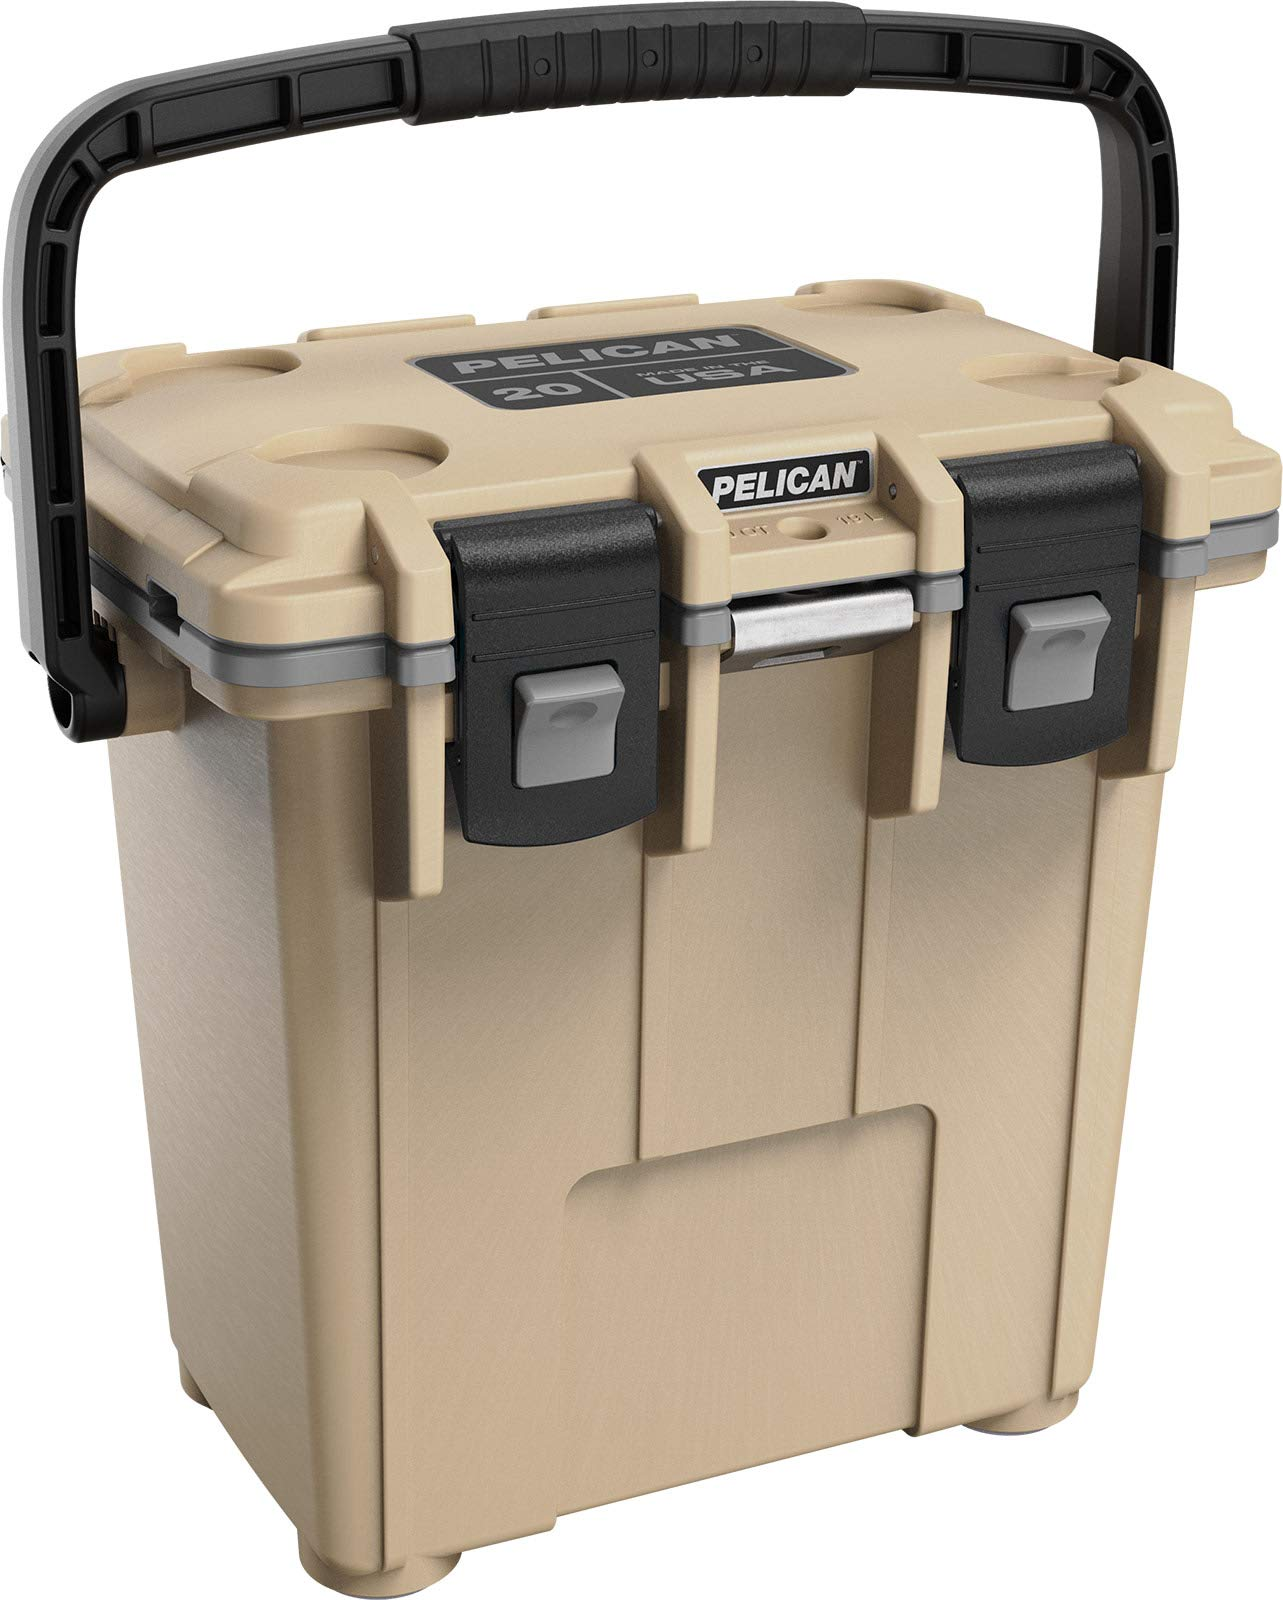 Pelican Elite 20 Quart Cooler (Coyote/Dark Grey)